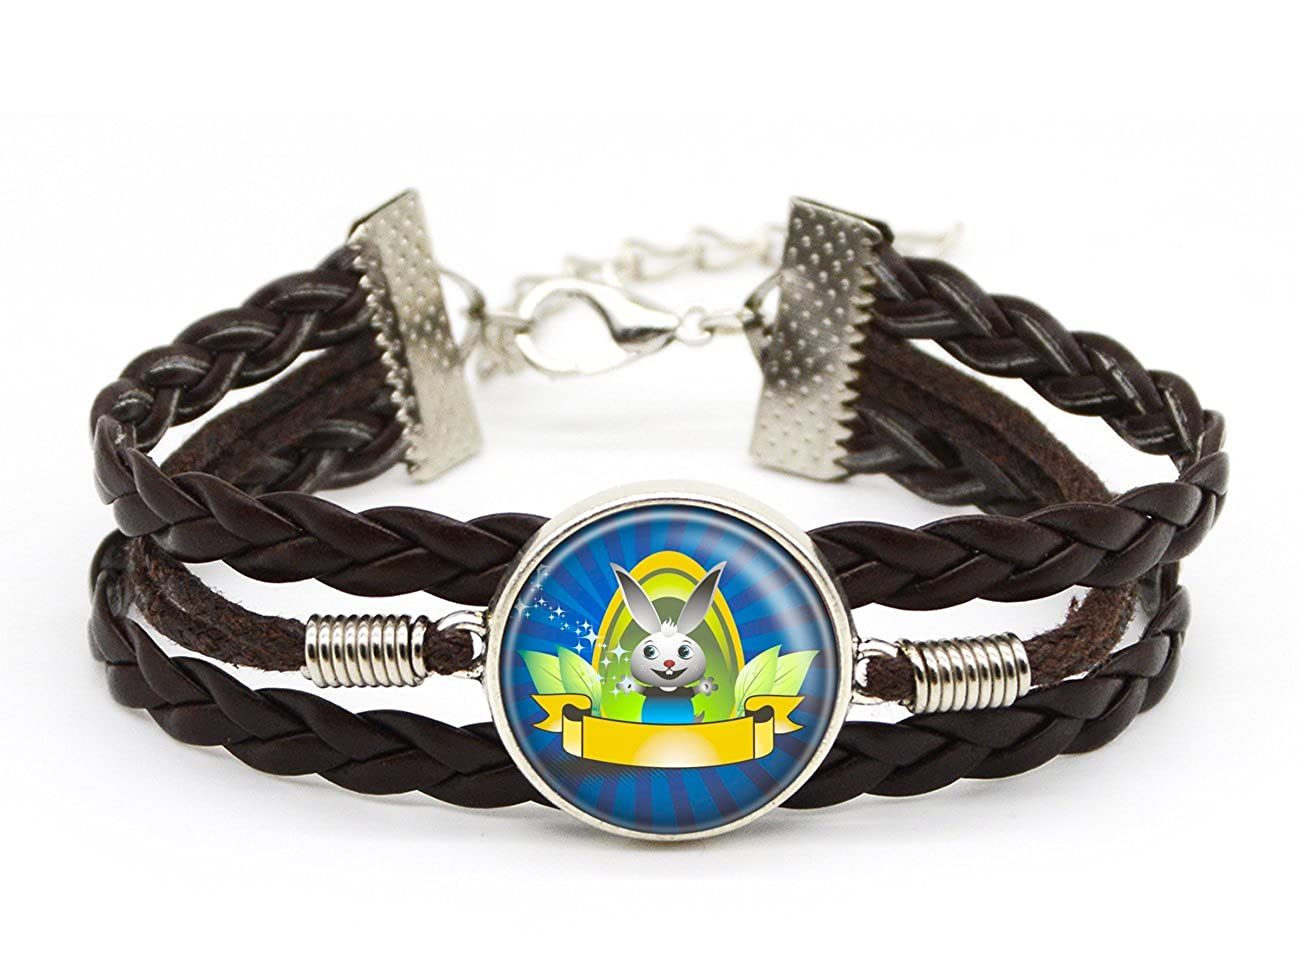 Lan Jin Art Bunny Bracelet Wild Animal Rabbit Jewelry Custom Brown Leather Glass Picture Bracelet